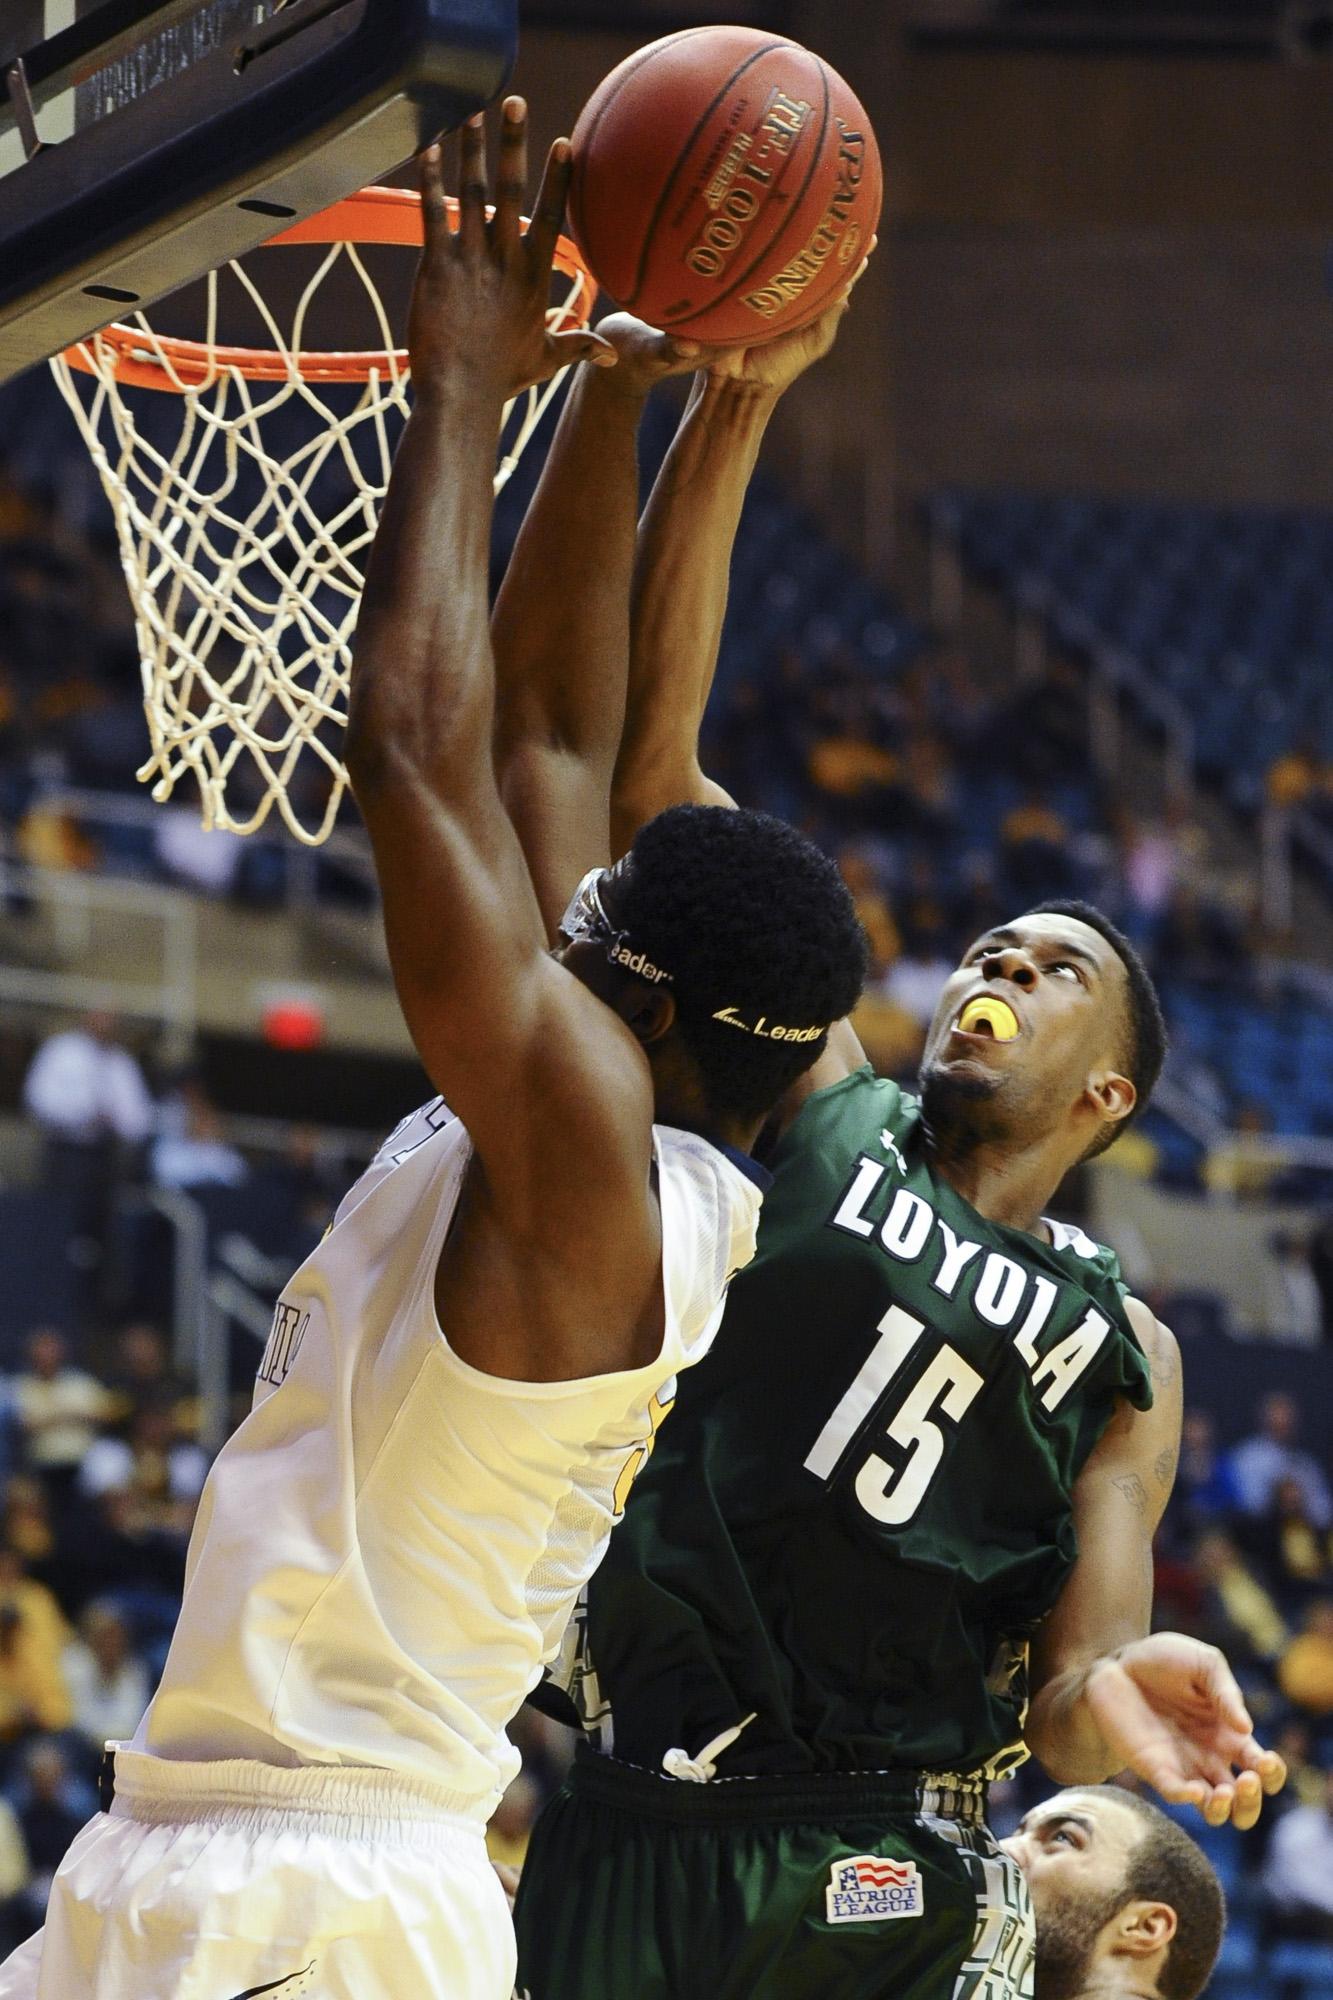 Loyola Maryland's Jordan Latham (15) blocks West Virginia's Devin Williams (left) during the second half of an NCAA college basketball game Monday, Dec. 2, 2013, in Morgantown, W.Va. West Virginia won 96-47